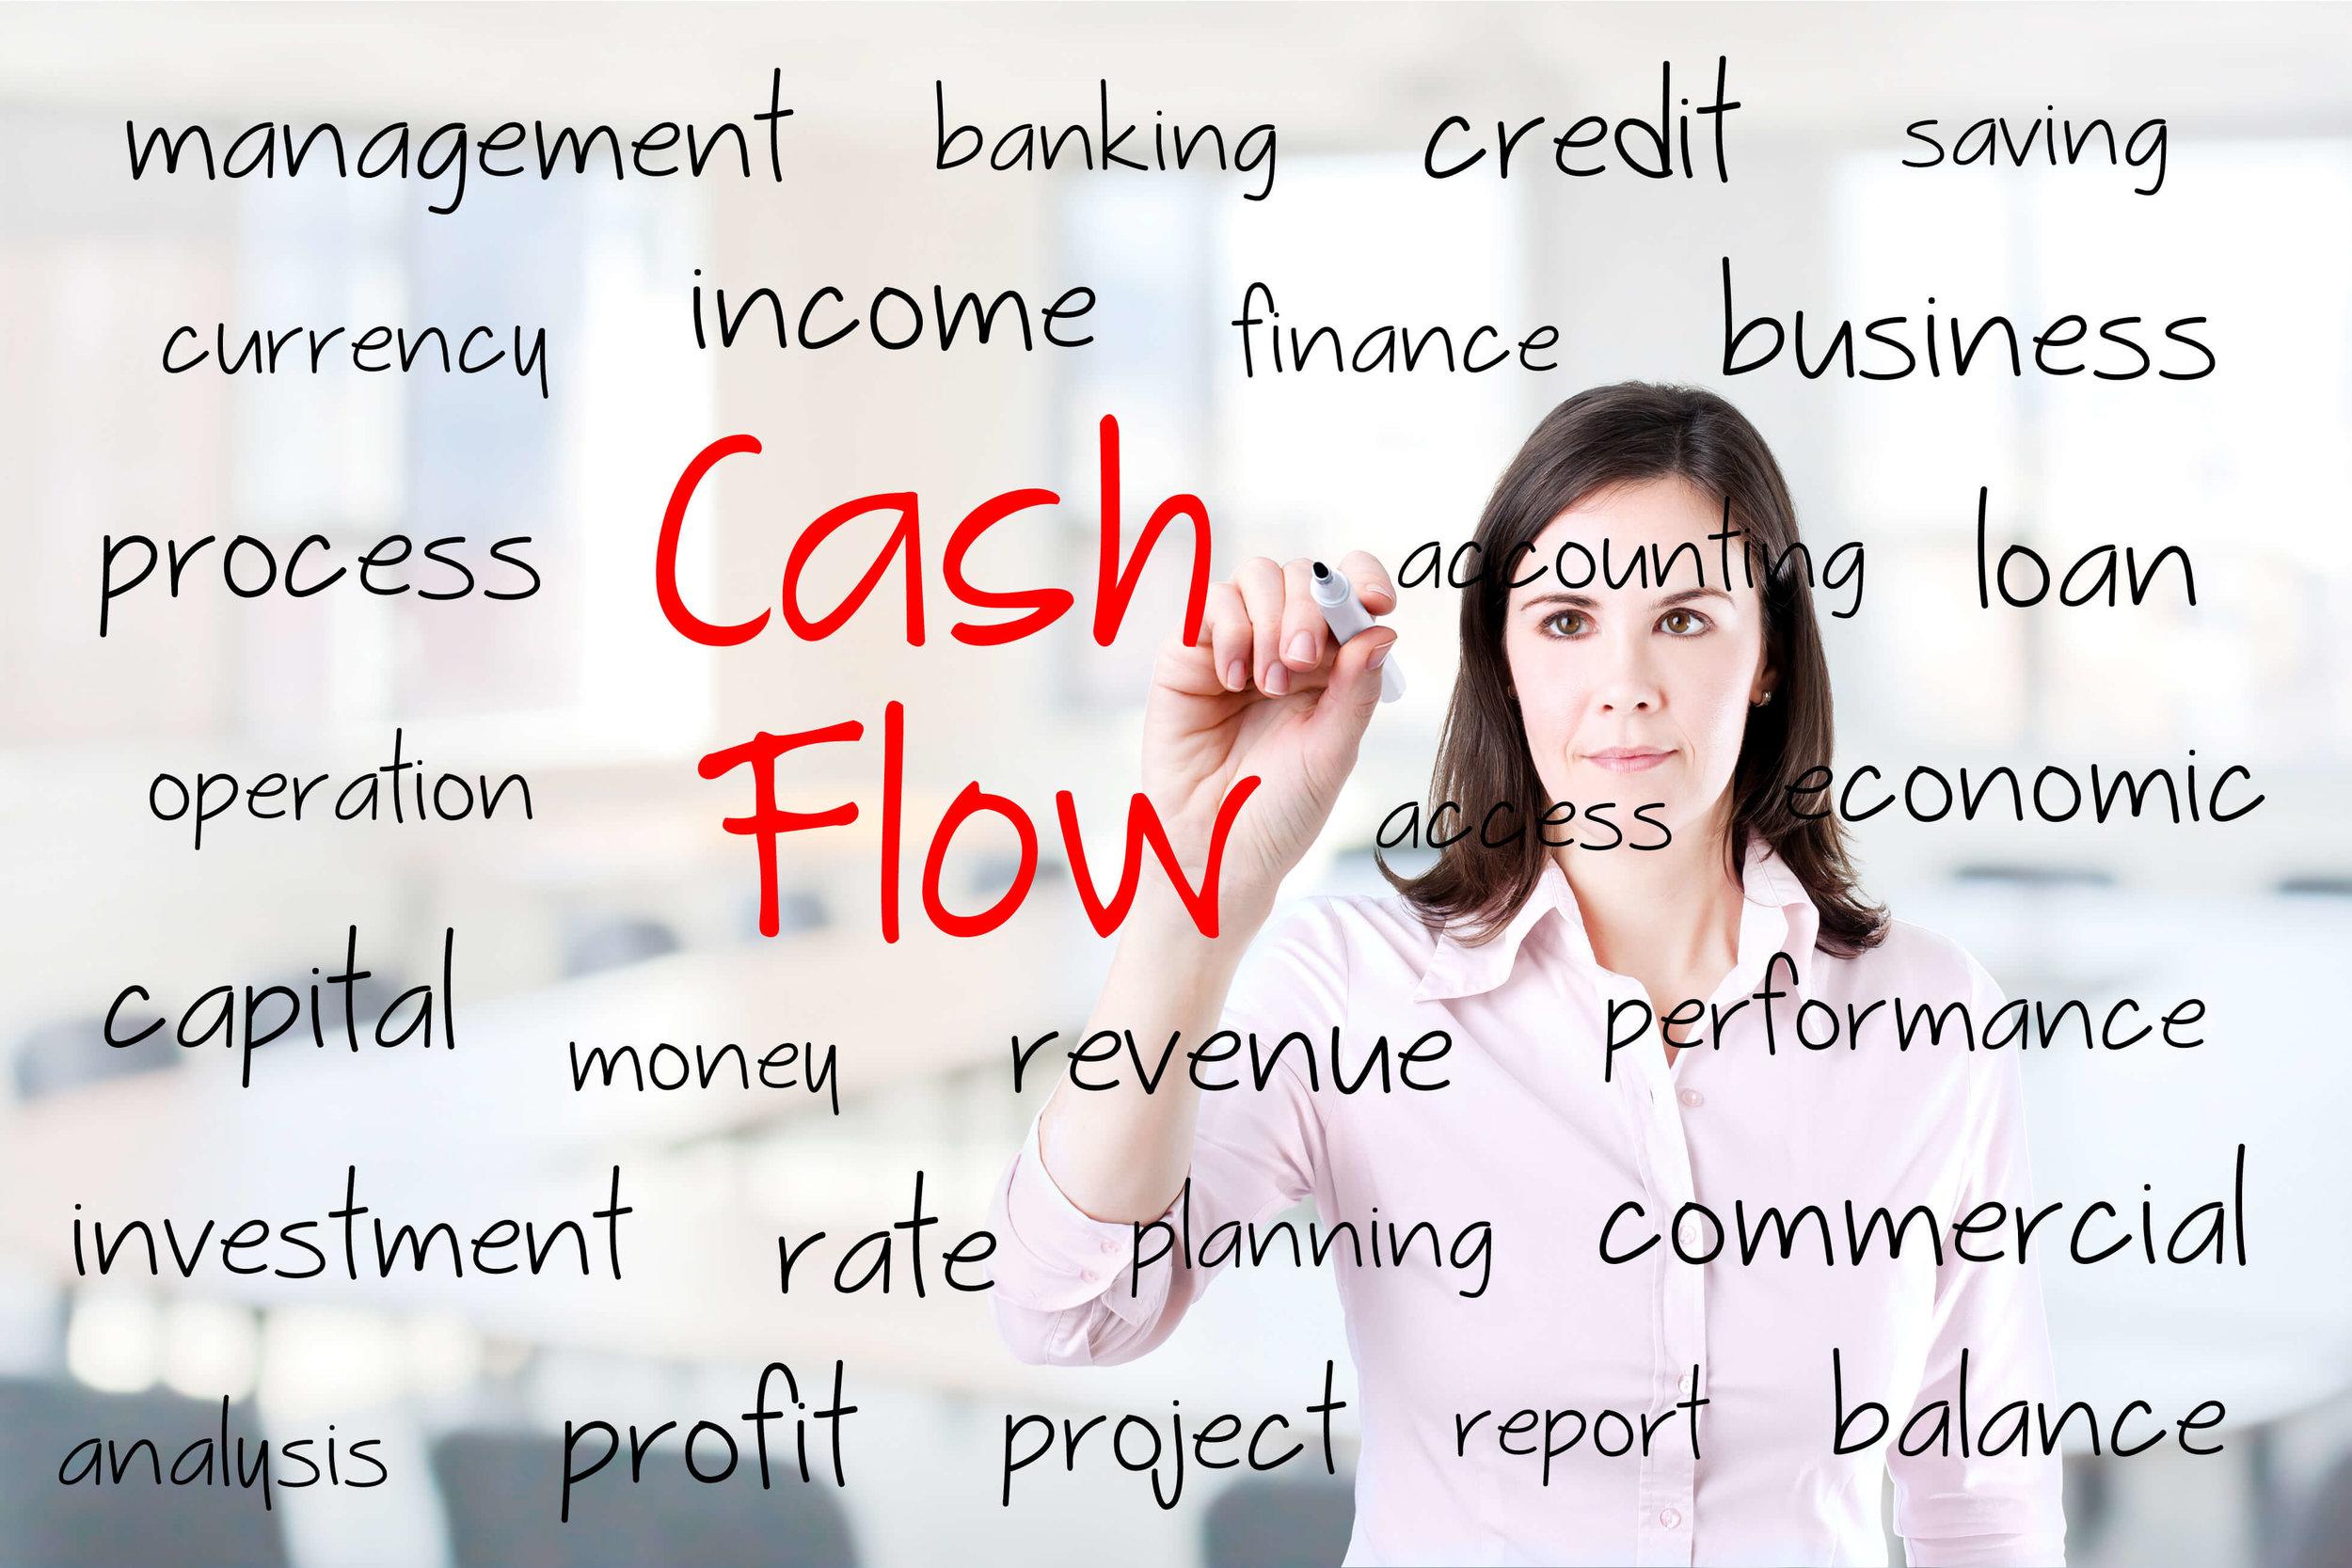 cash flow image women writing on whiteboard